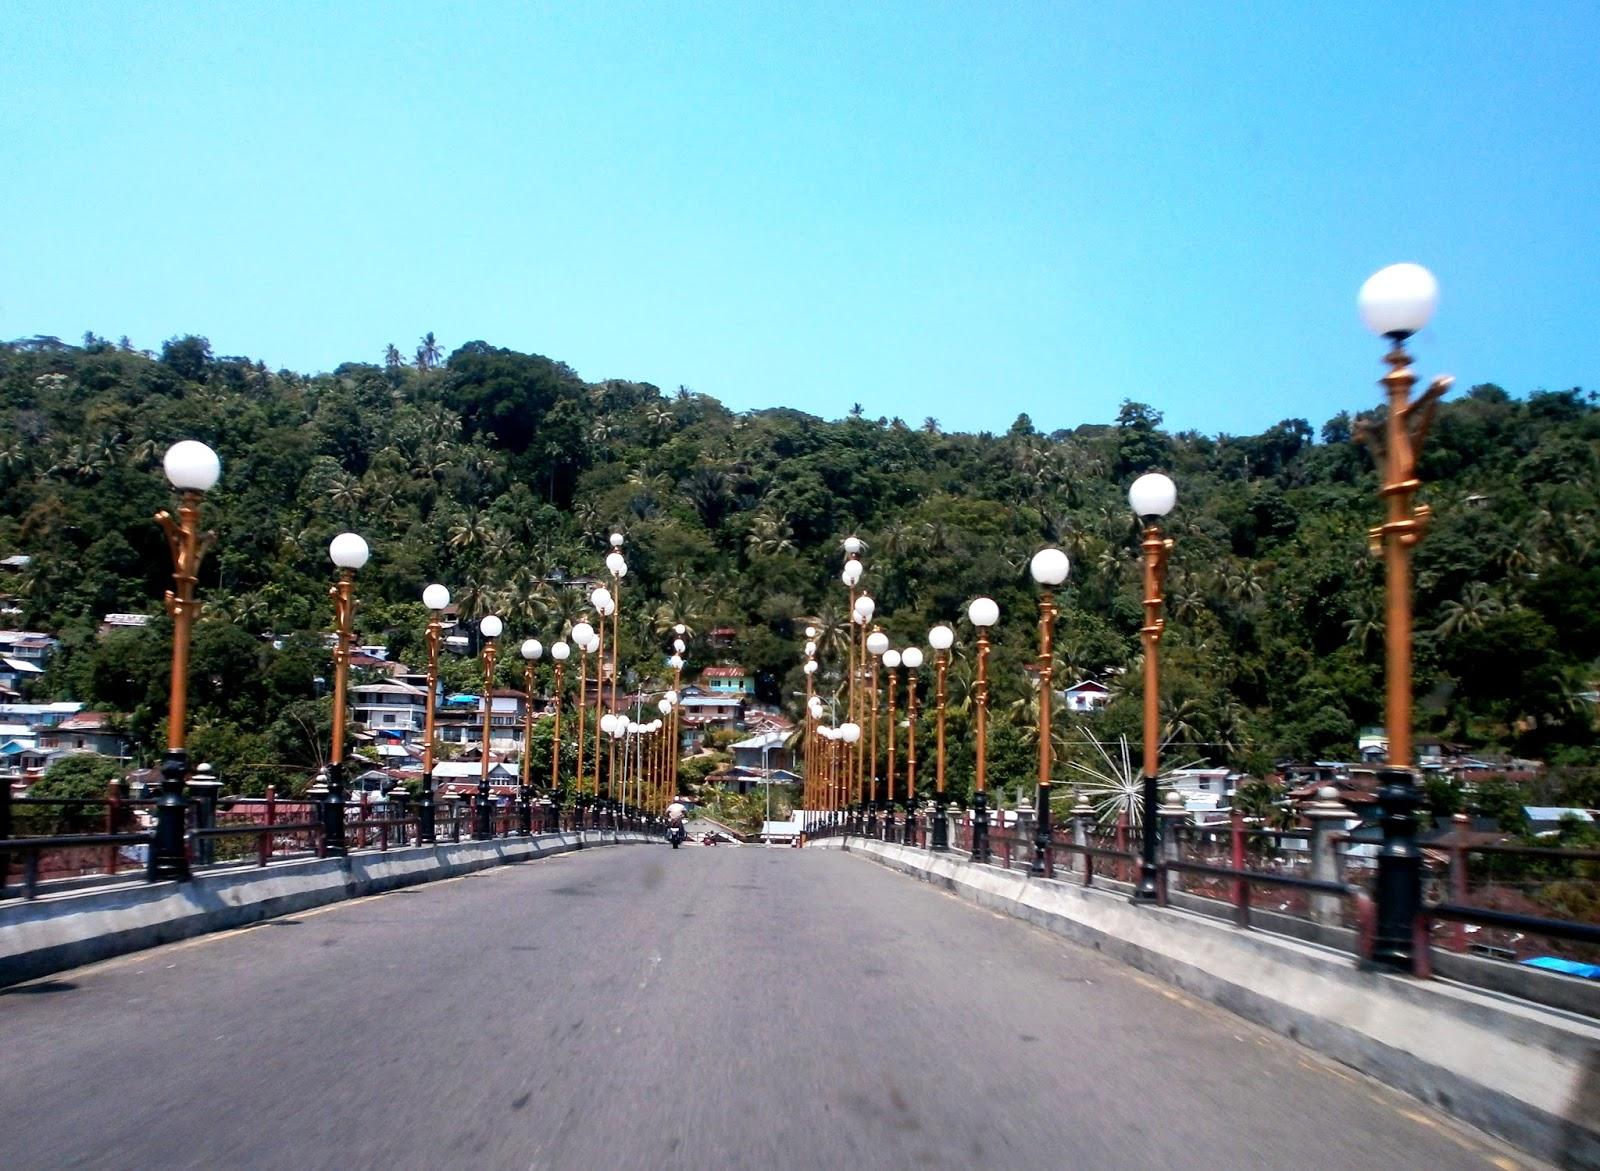 Pesona Muaro Padang Jembatan Siti Nurbaya Minang Kabau Termasuk Kawasan